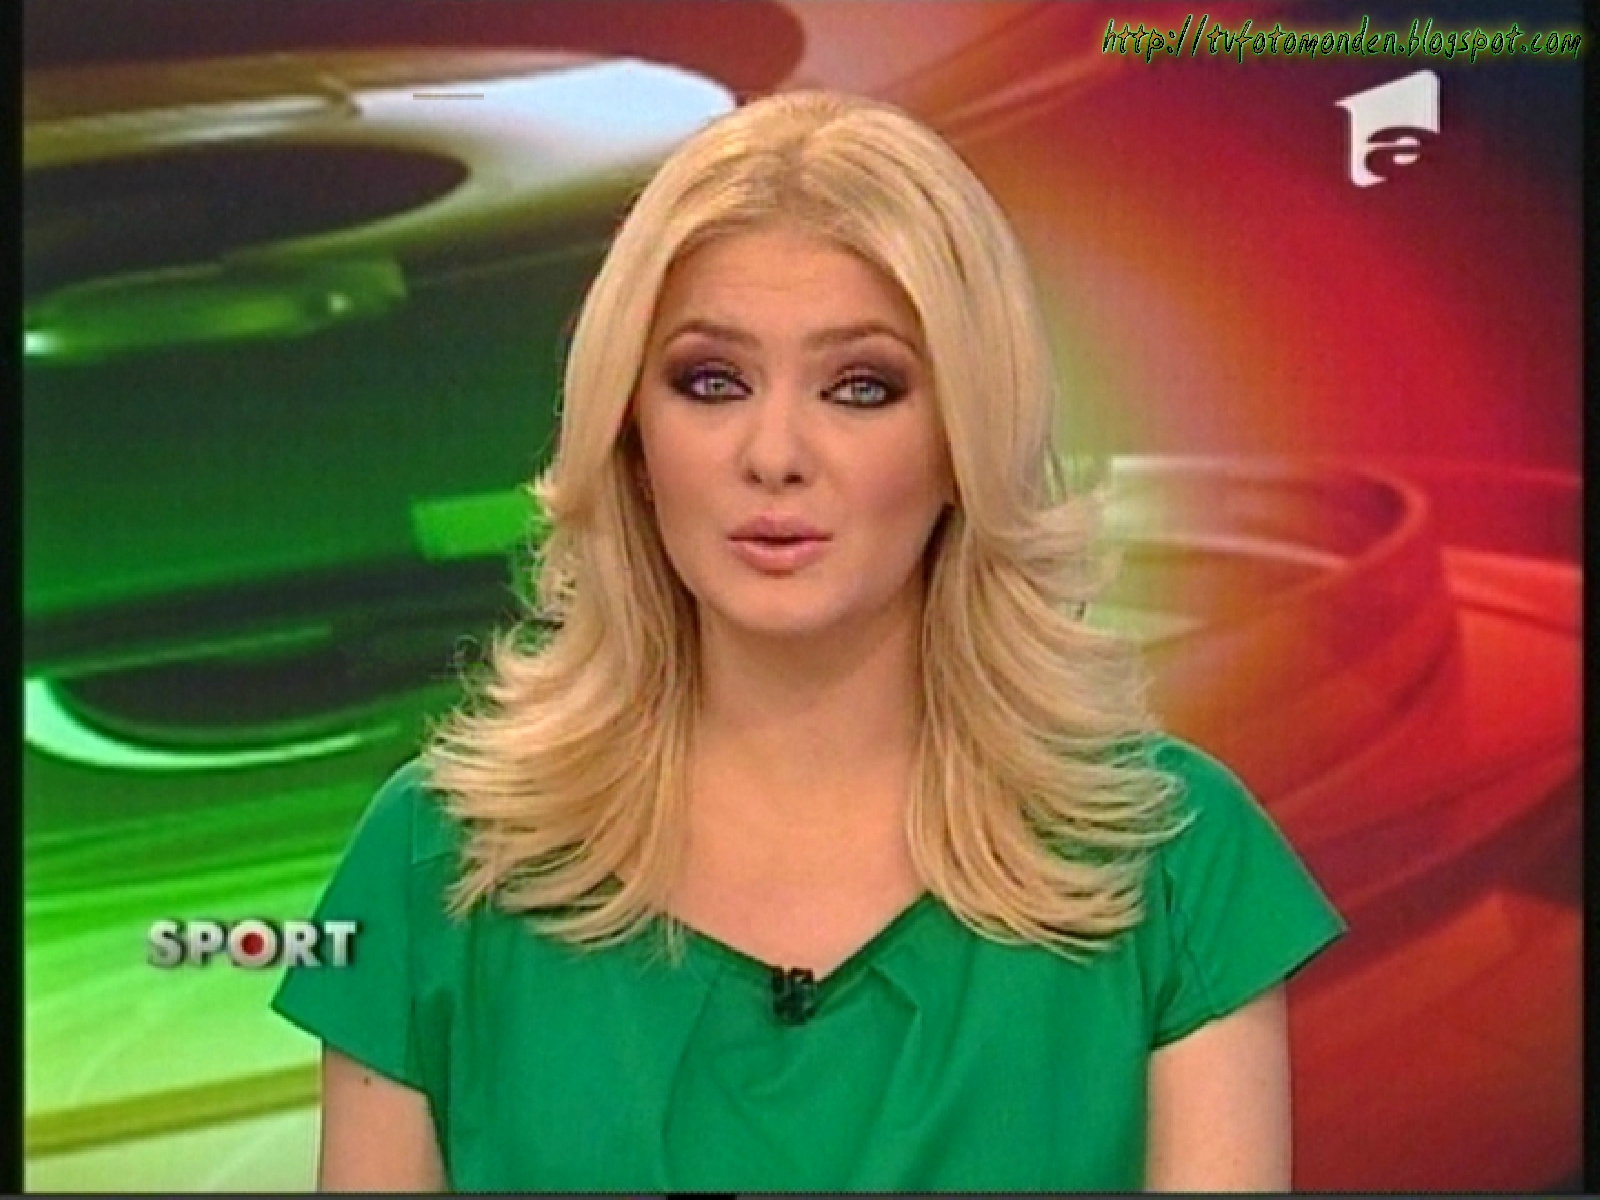 ... Dochianu 100 einzahlungsbonus williamhill prezinta stirile din sport la Antena 1 - 02 februarie